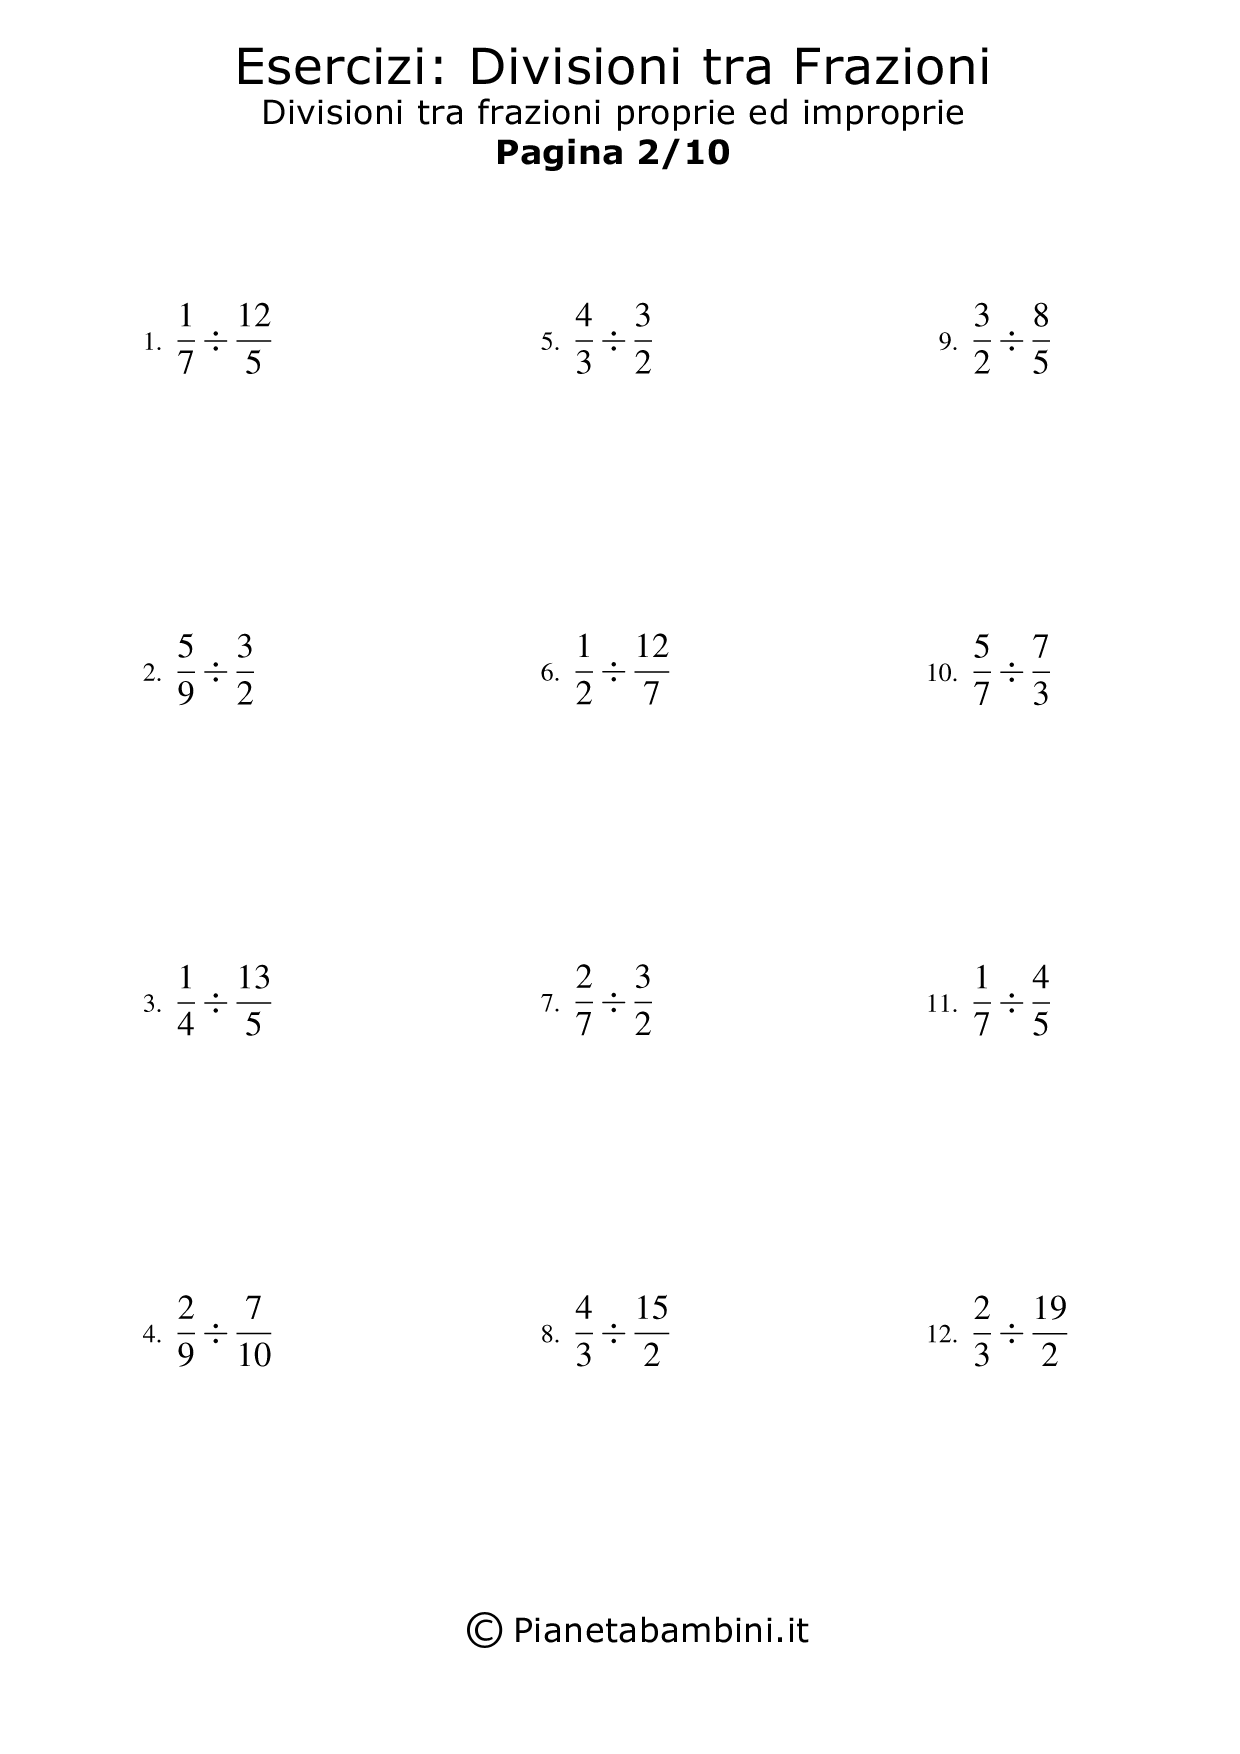 Esercizi-Divisioni-Frazioni-Proprie-Improprie_02